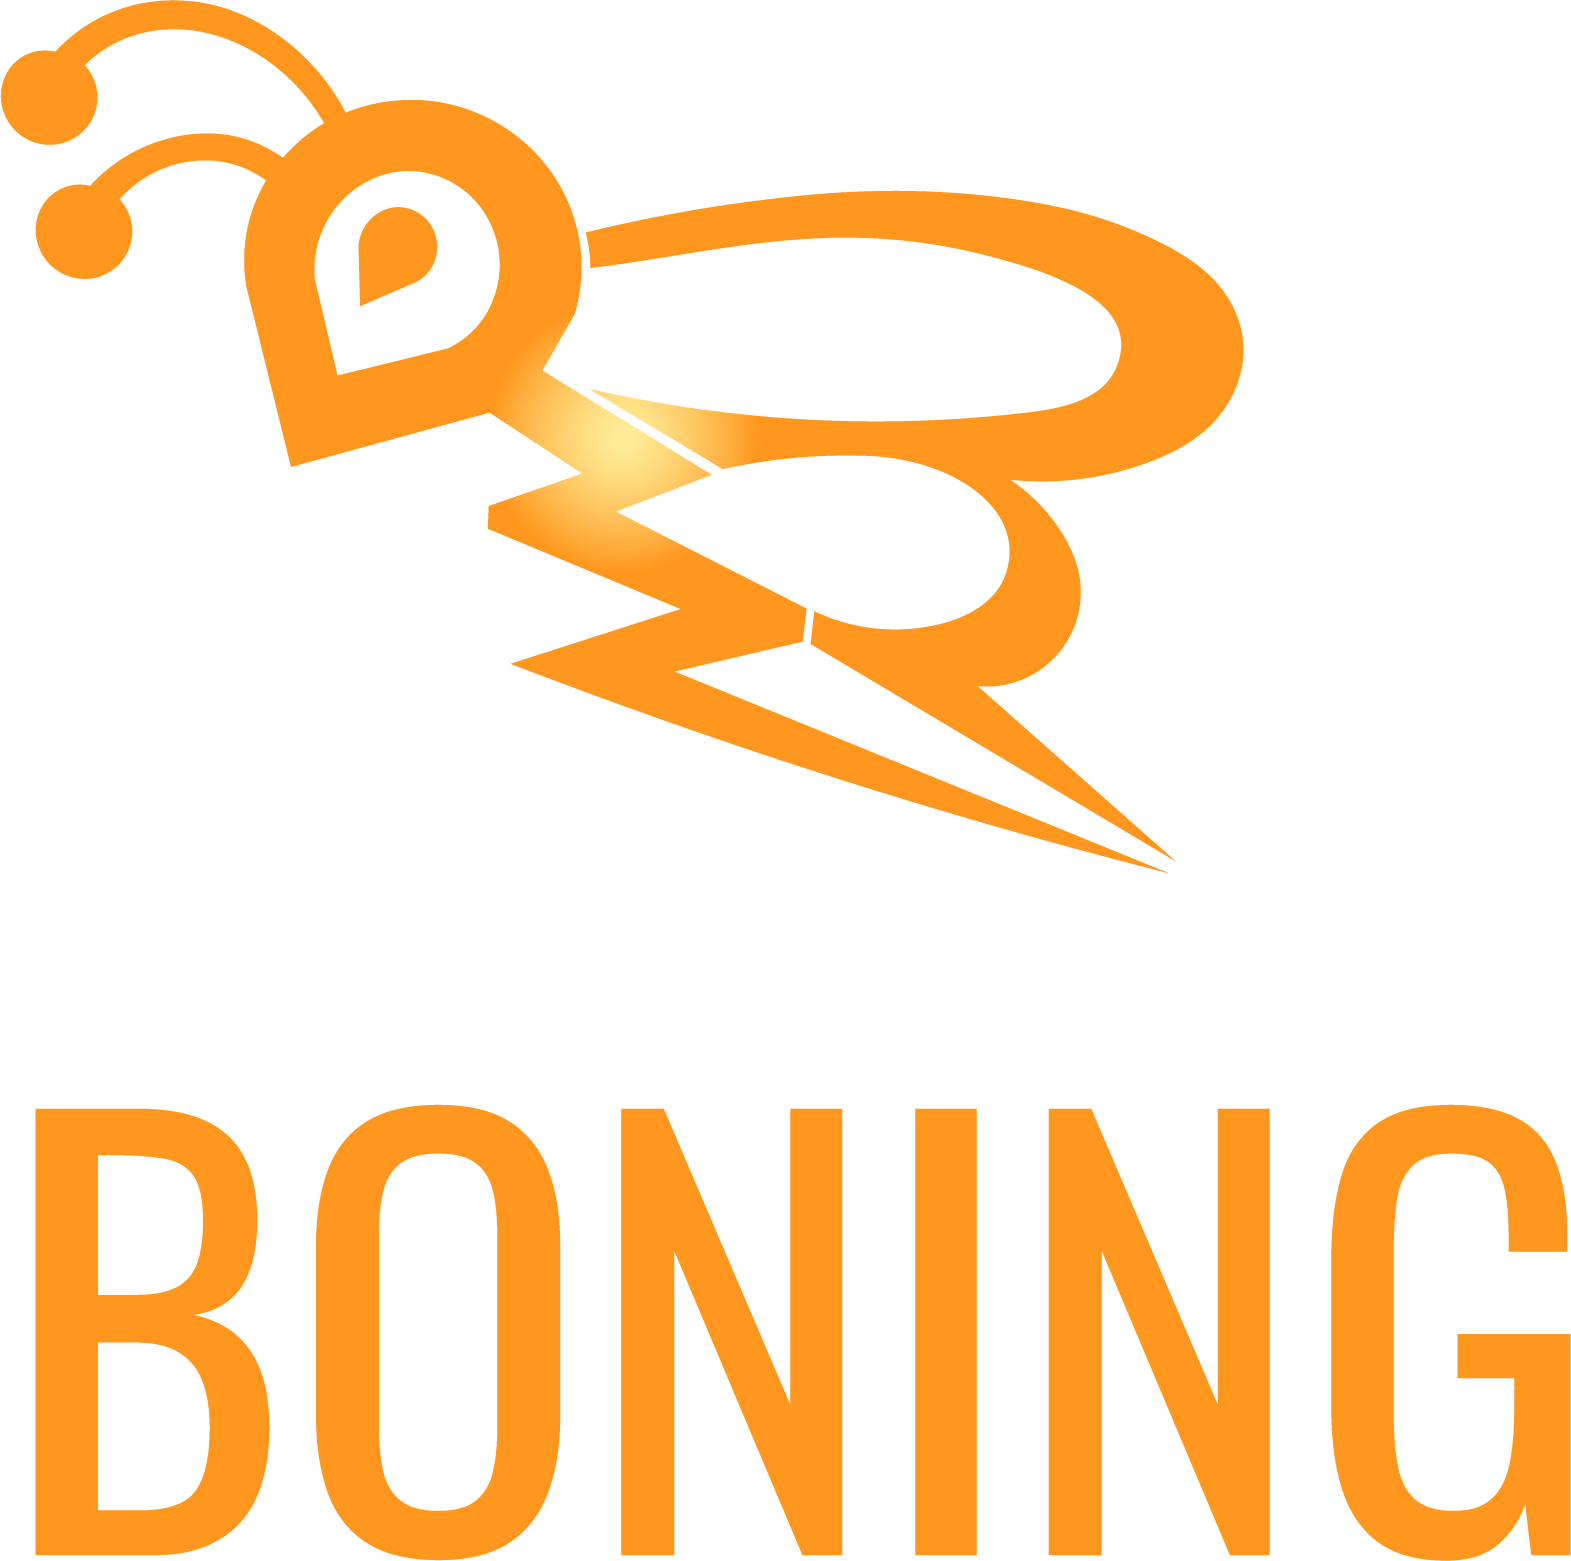 The Boning